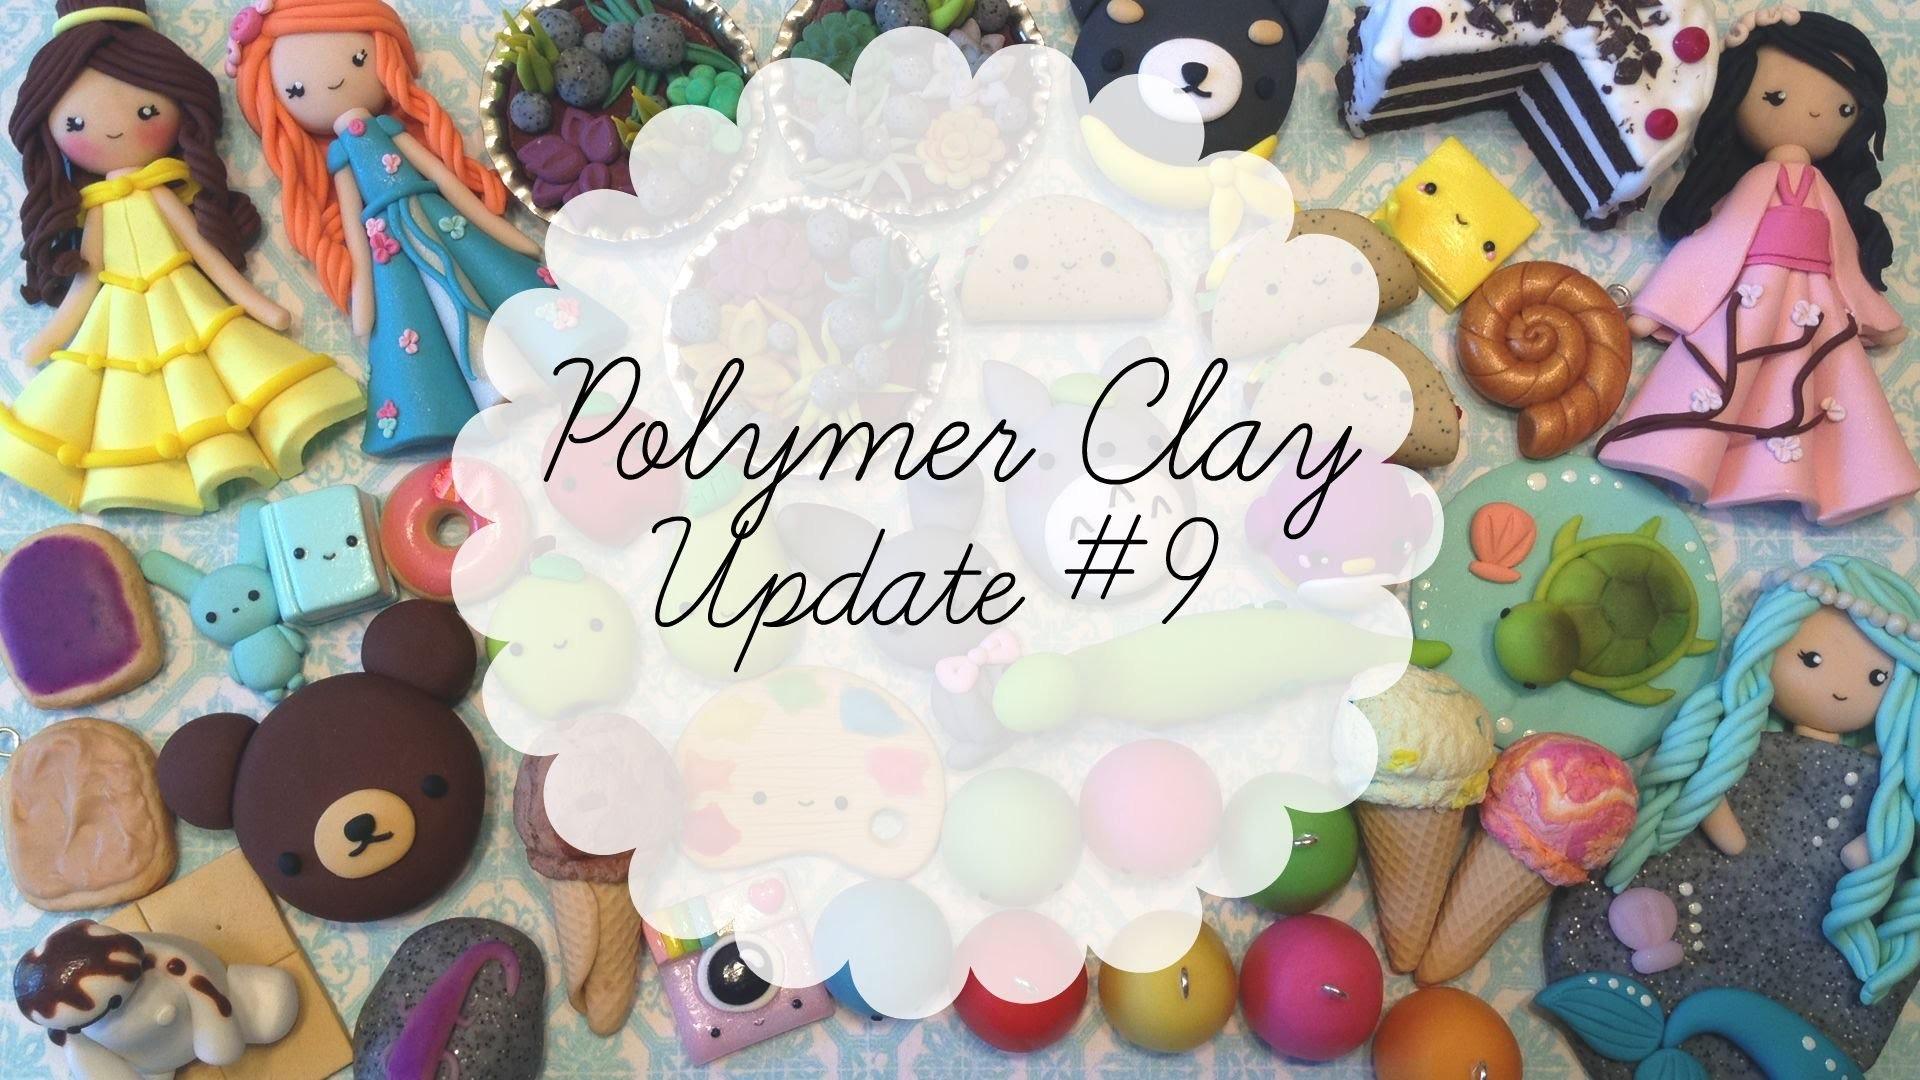 ✿ Polymer Clay Update #9 ✿